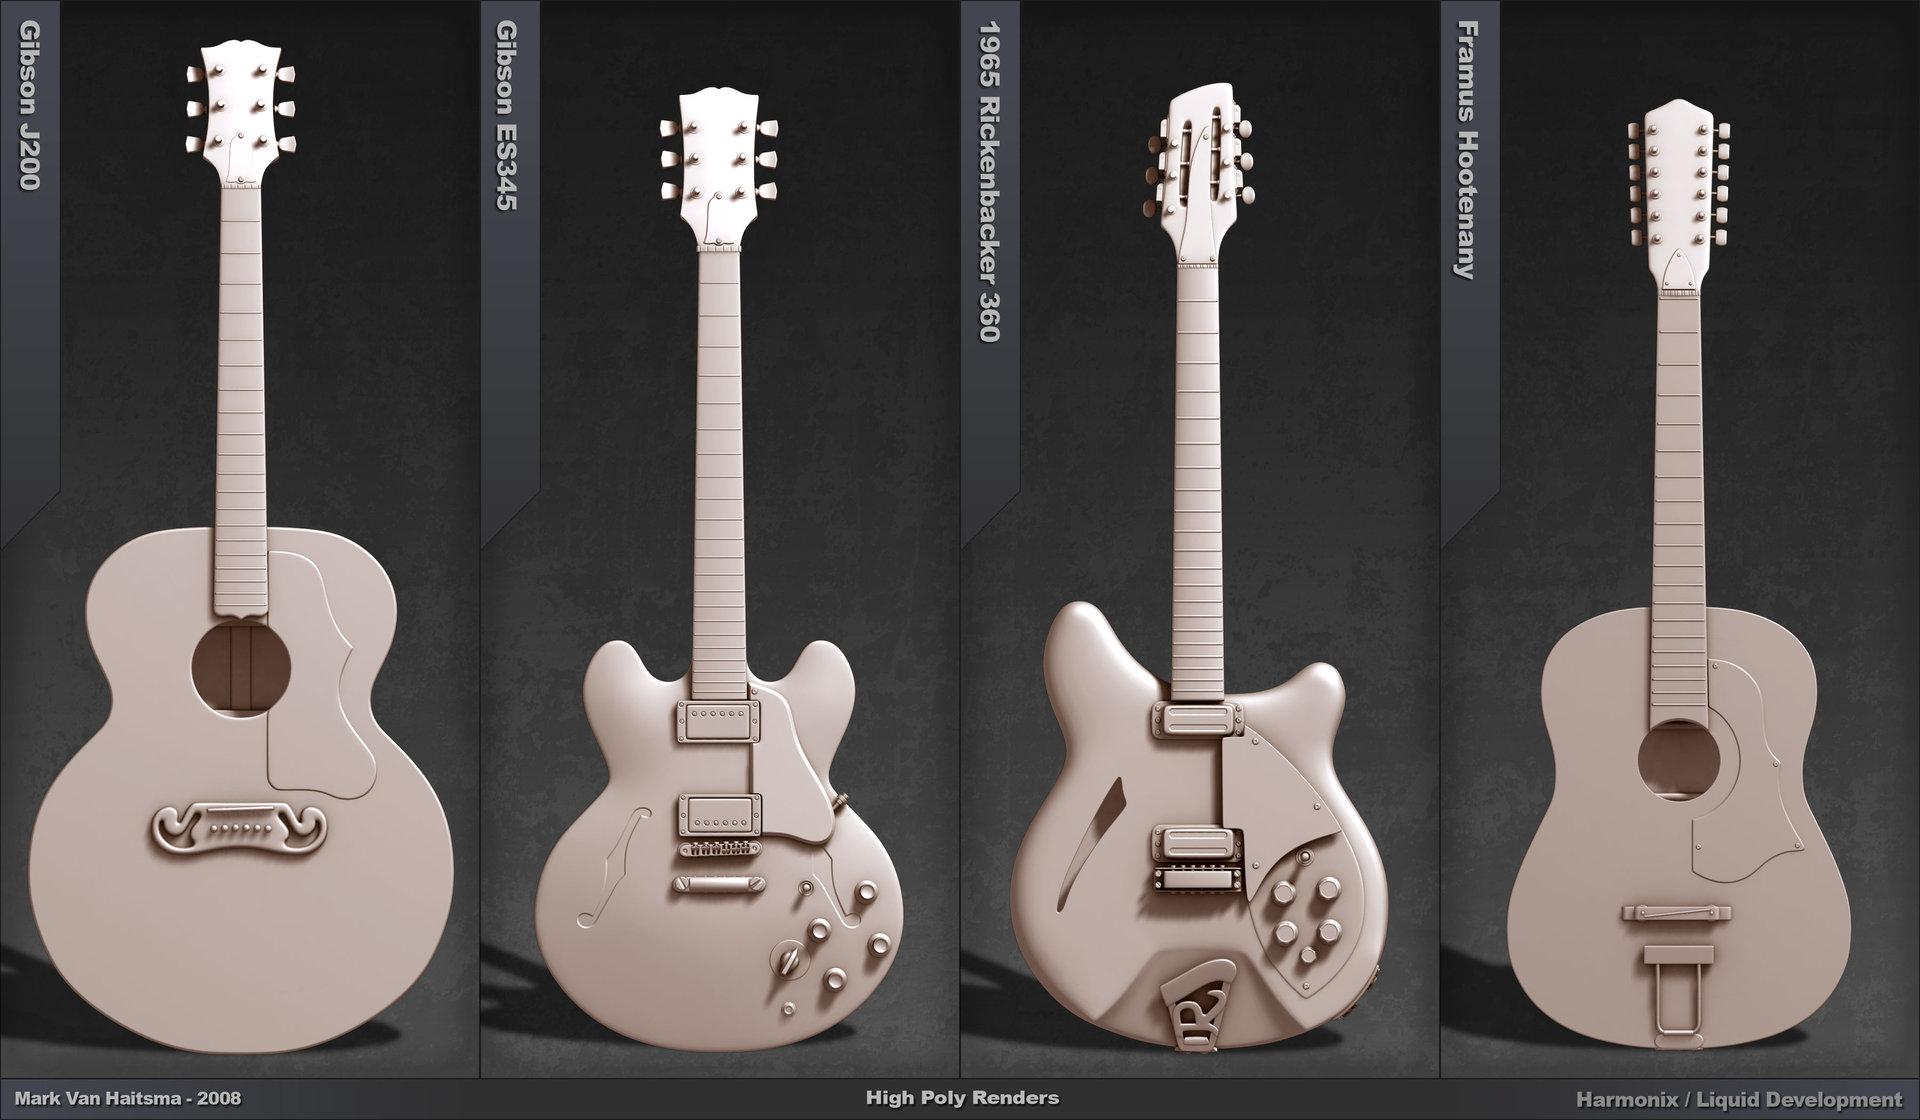 Mark van haitsma guitar portfolio page 4 models